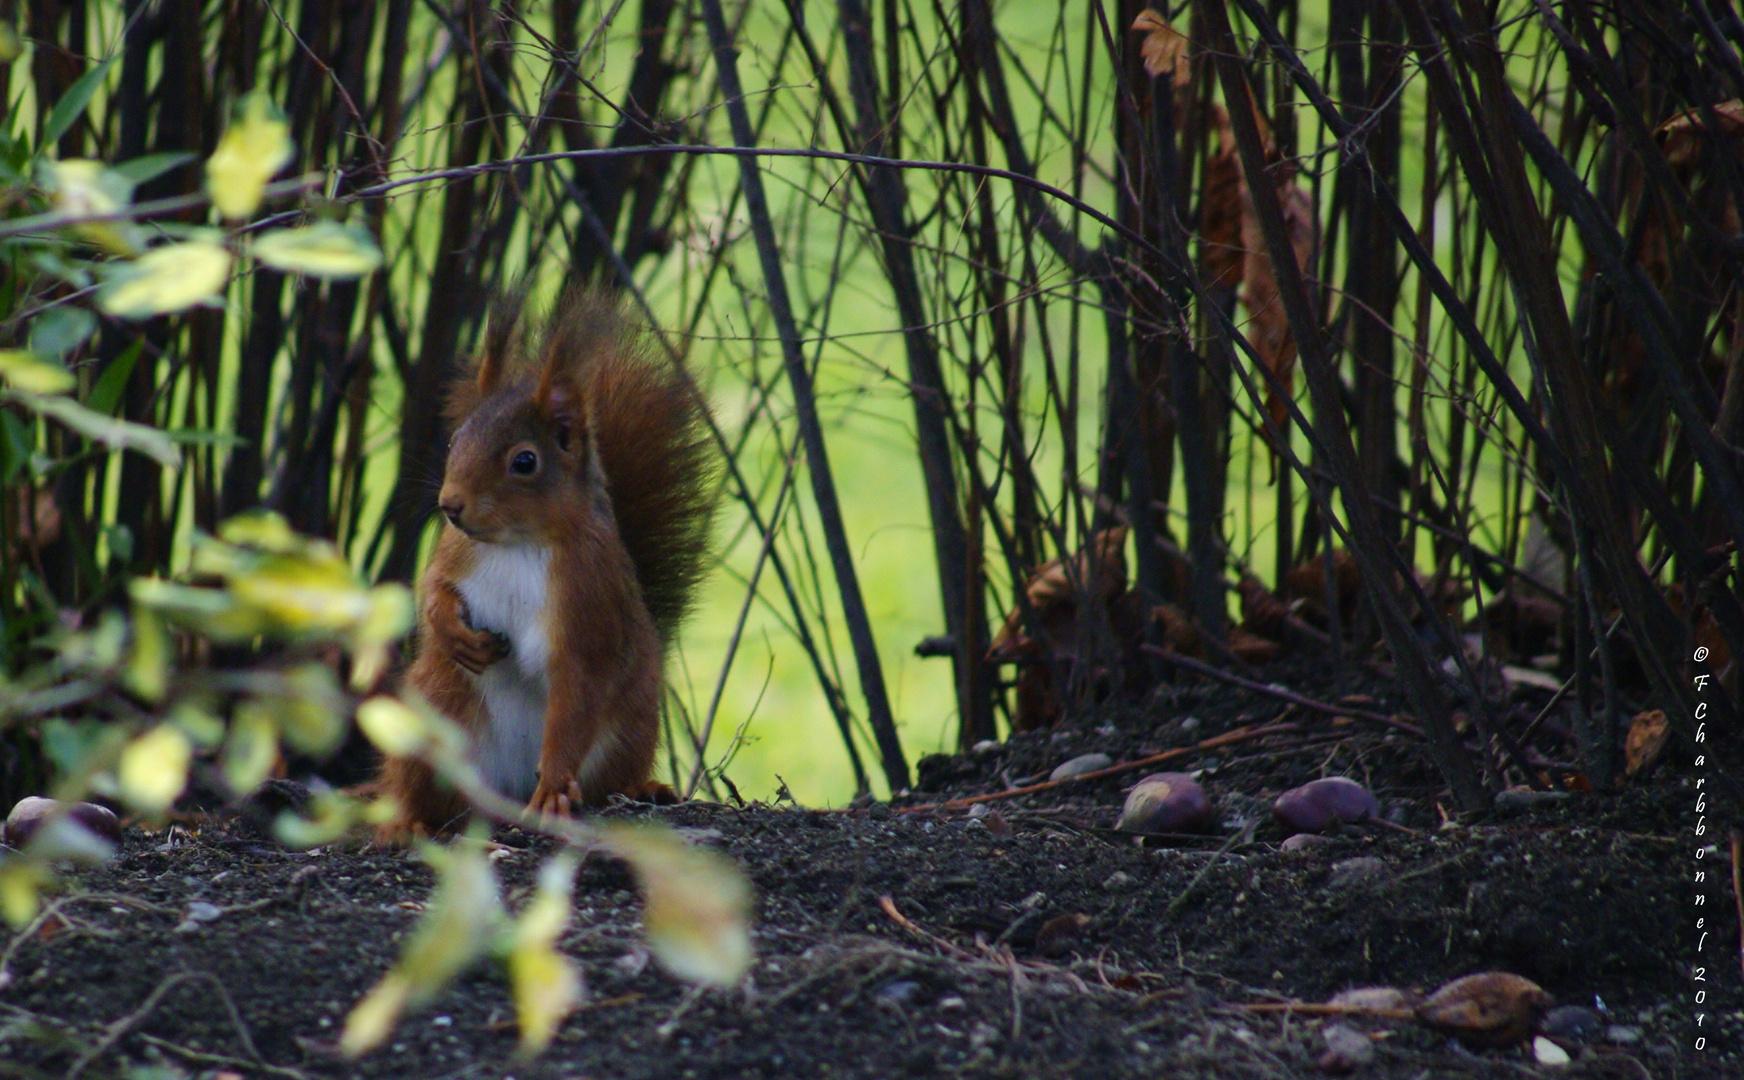 jojo l'ecureuil